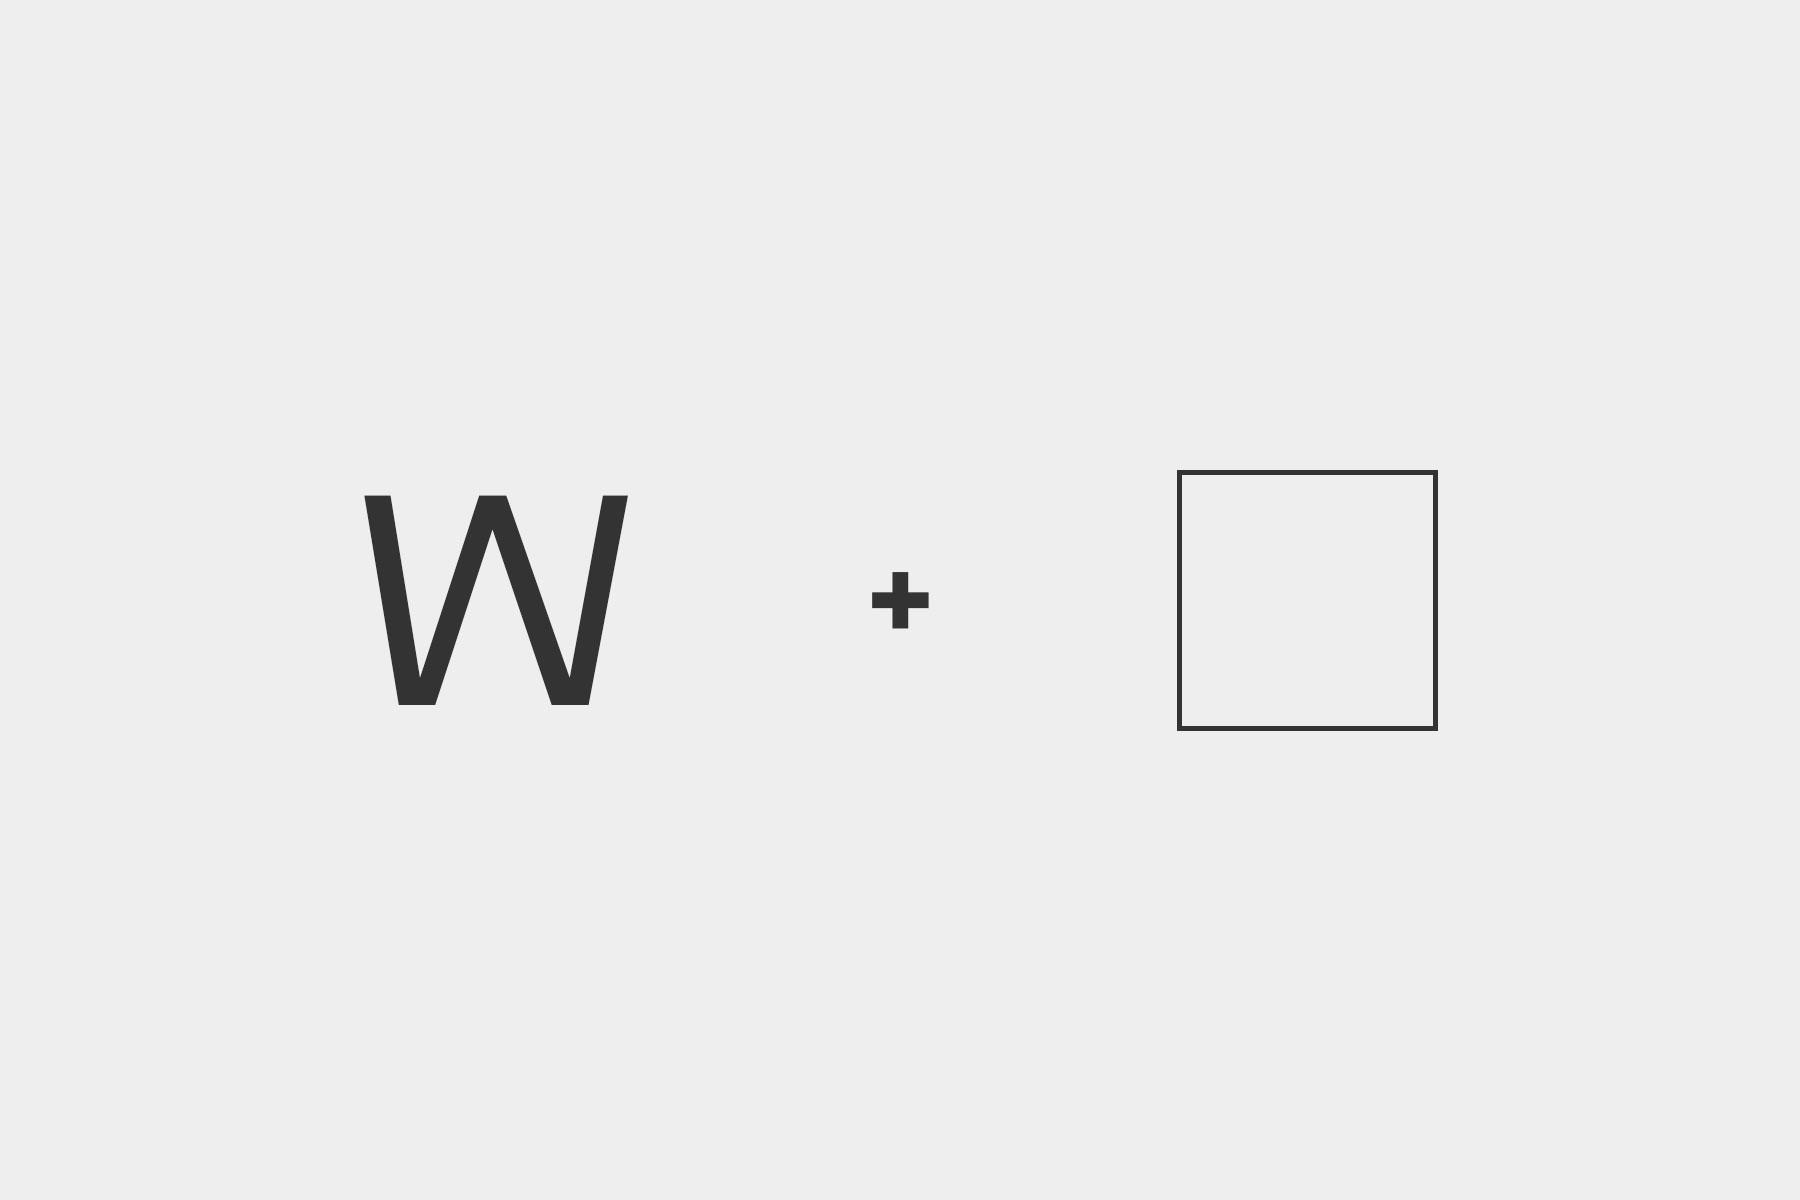 Логотип Woxwel Design - концепция